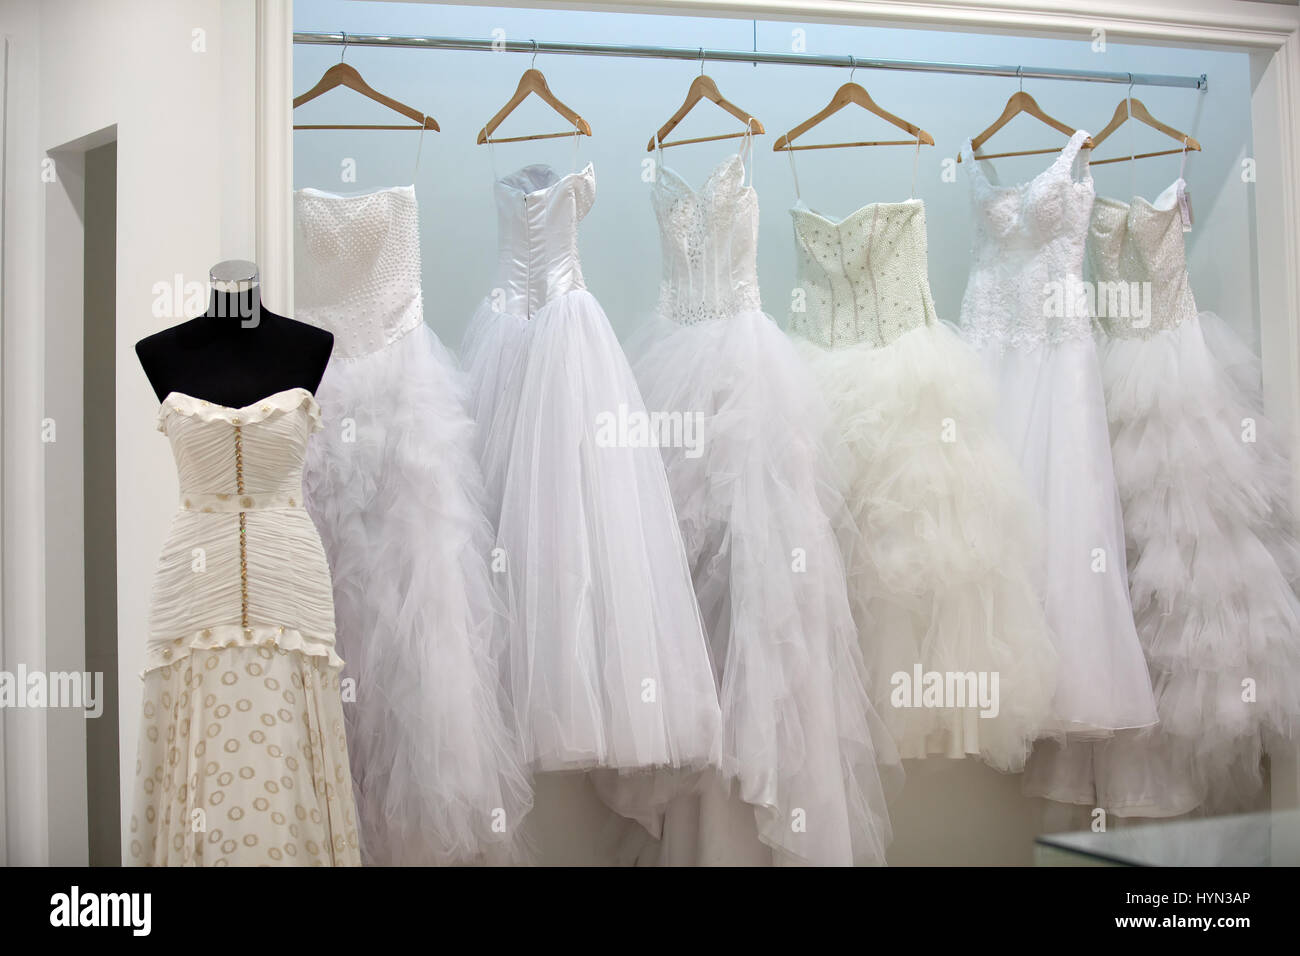 Garment Shop Stockfotos & Garment Shop Bilder - Alamy